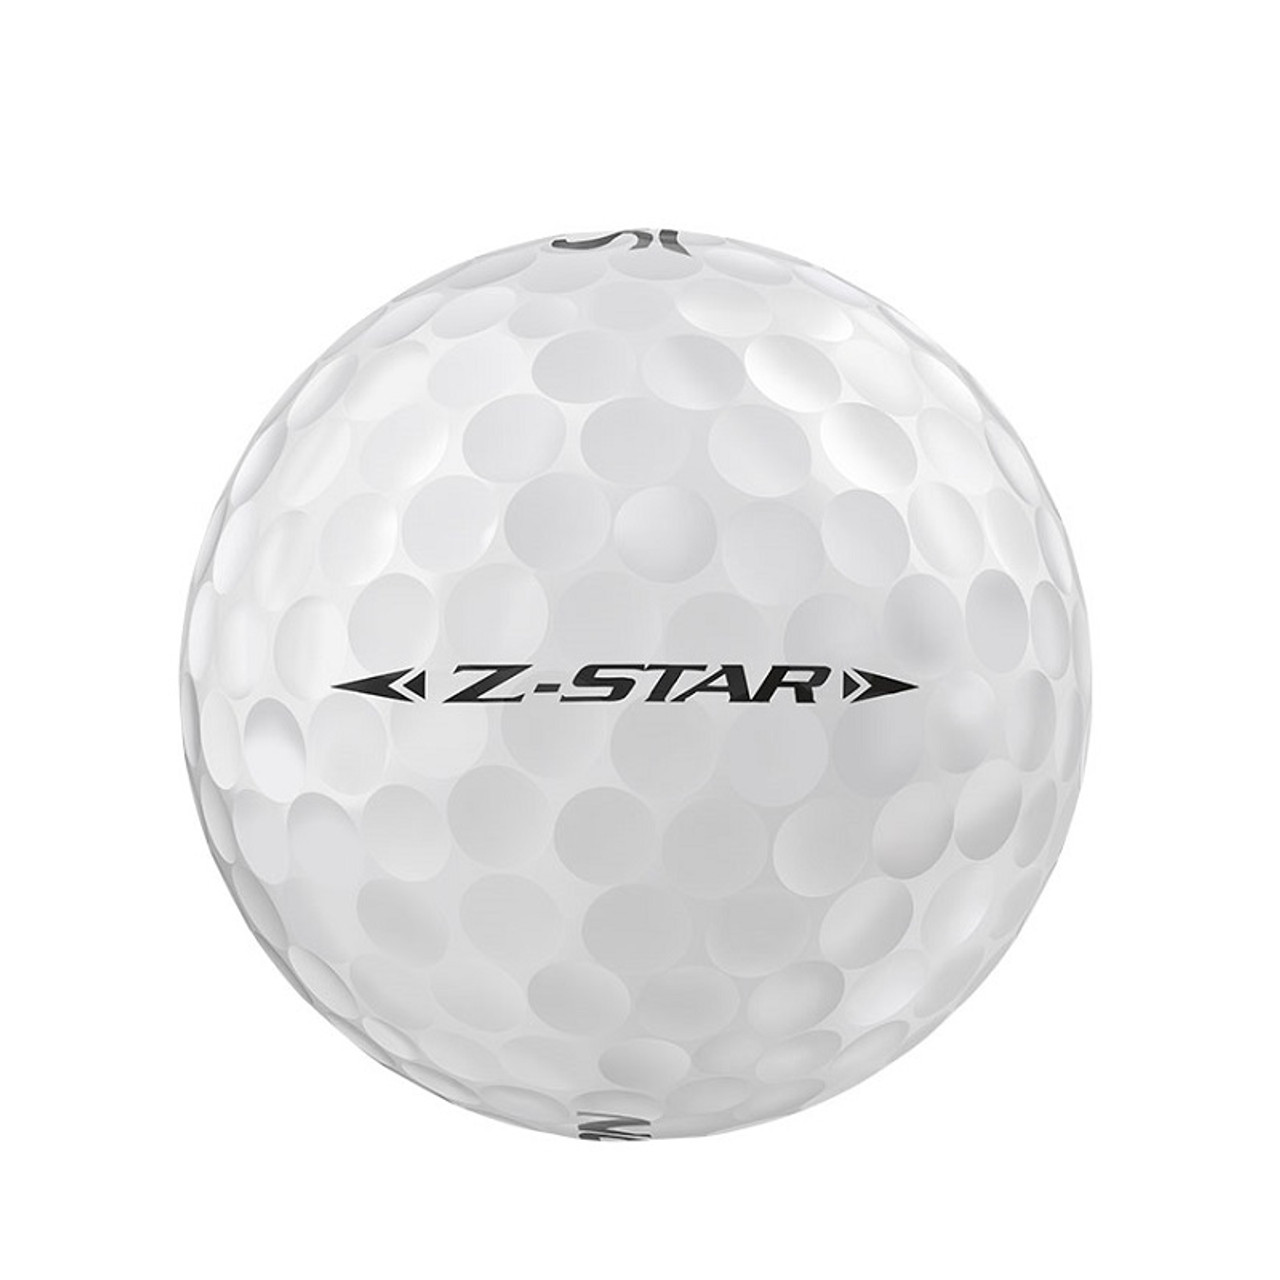 Srixon Z-Star 6 Personalized Golf Balls Dozen 2019